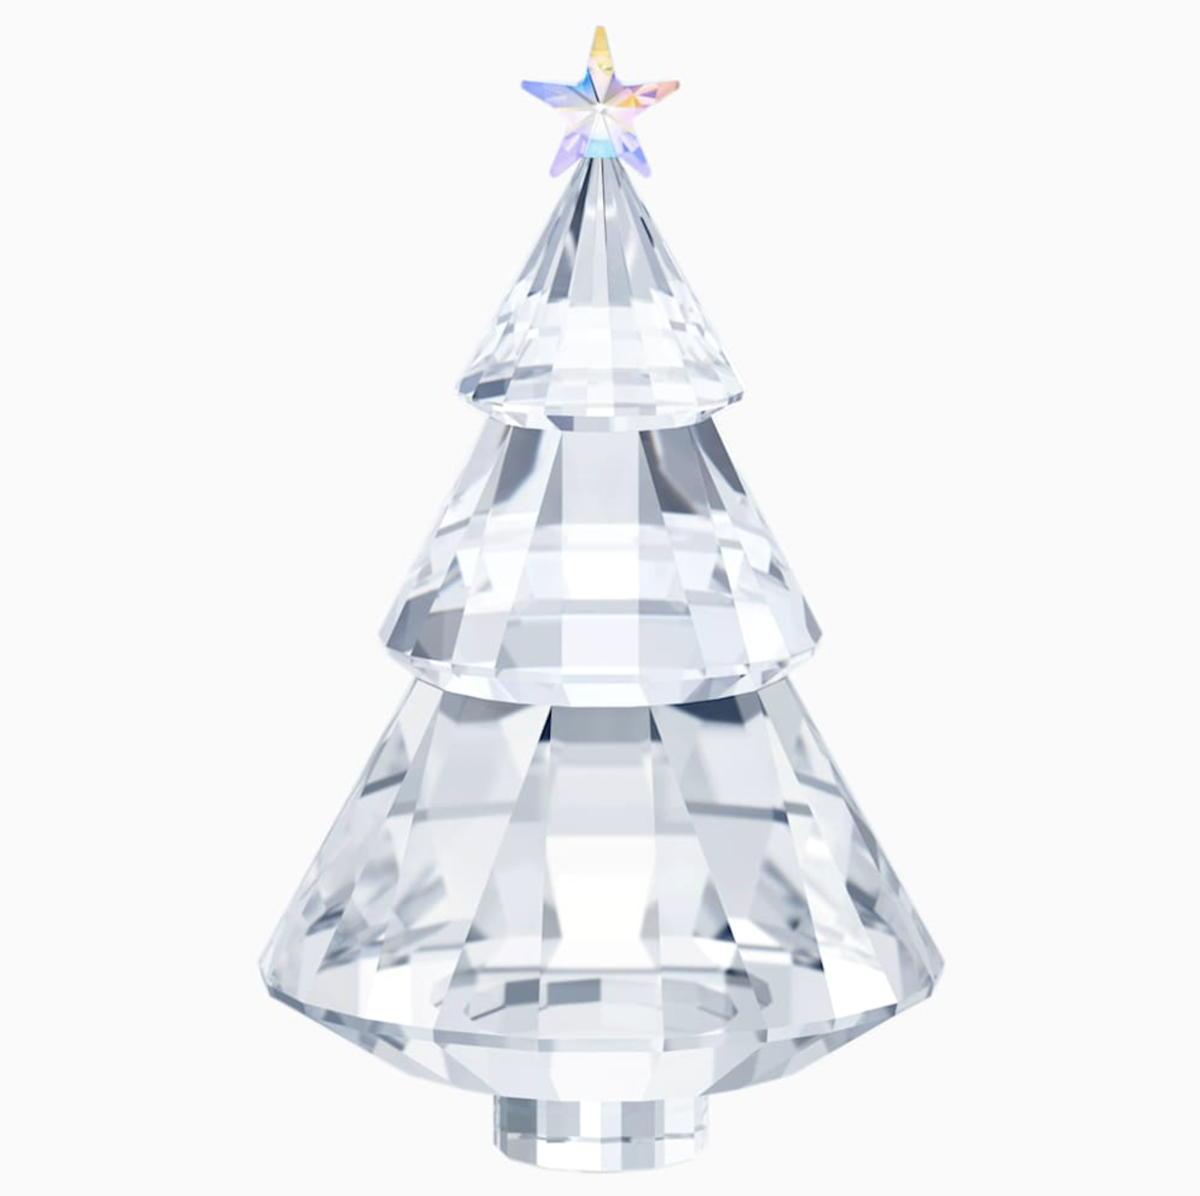 addobbi-natalizi-cristallo-foto-idee-costi-5